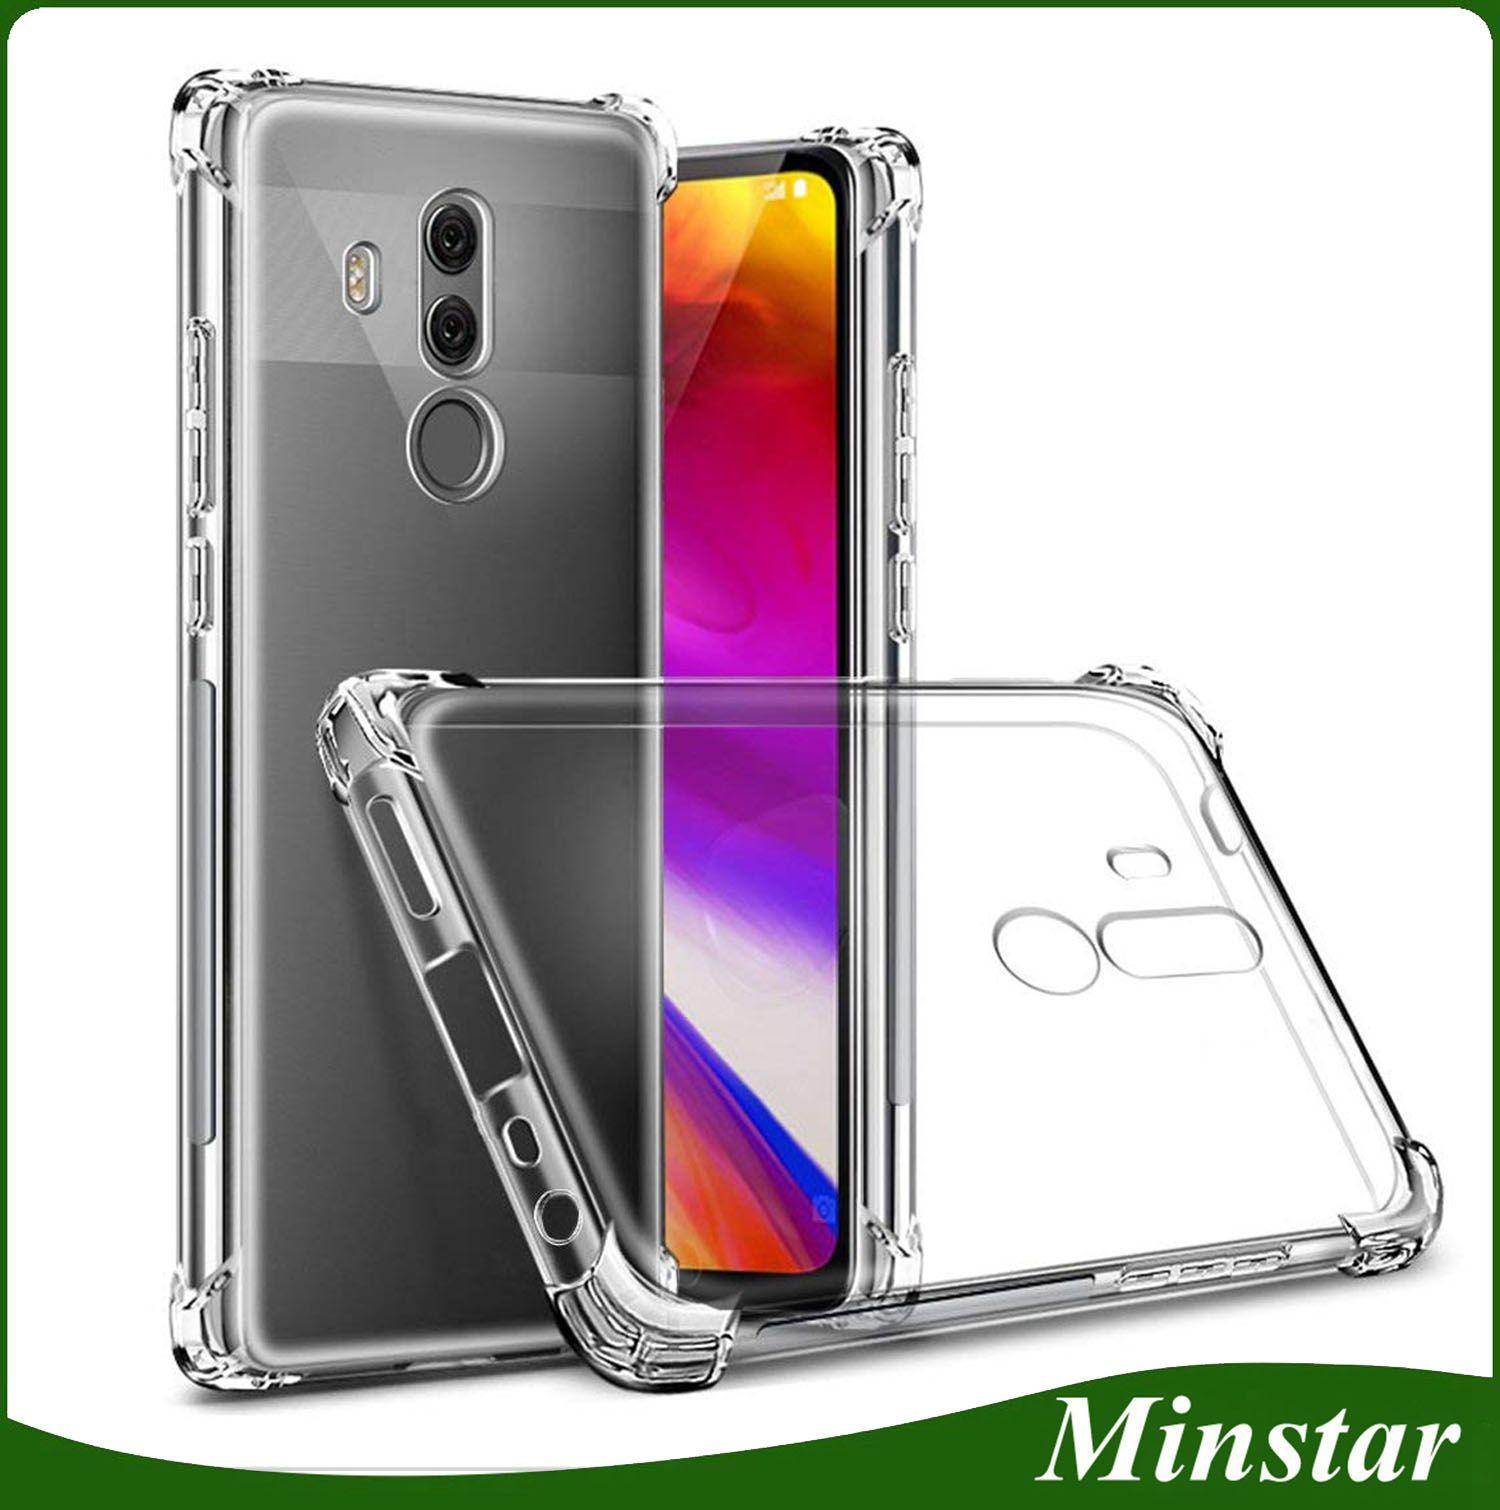 Clear TPU Bumper Cases Soft Gel Phone Case Cover For LG Q7 Q7 G6 G7 V35  ThinQ LV5 K20 Plus K30 2018 V40